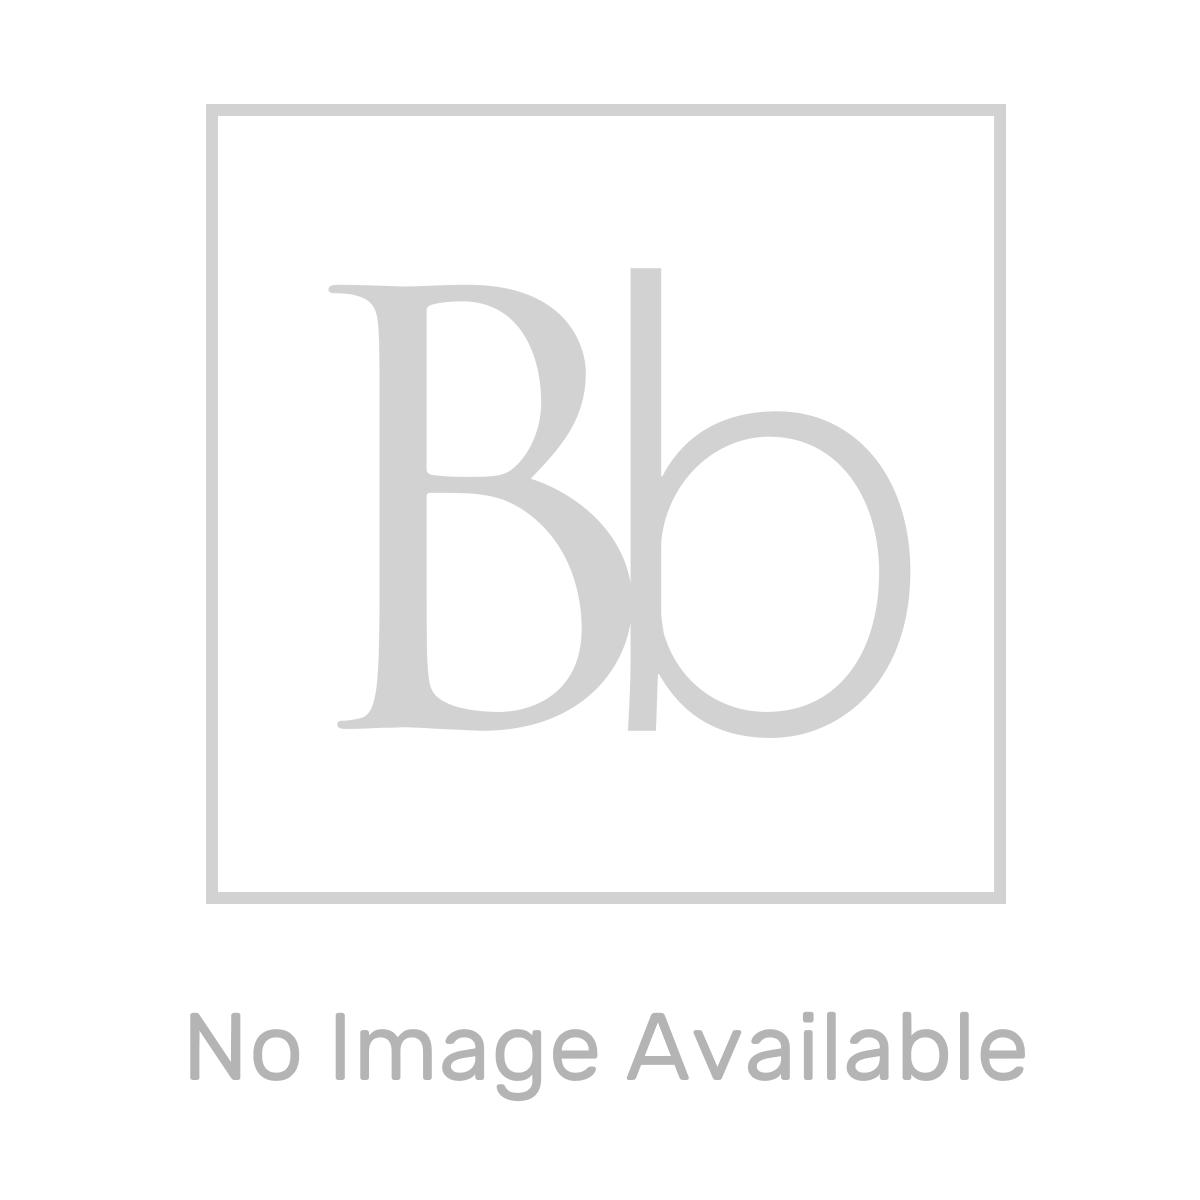 RAK Series 600 Right Handed P Shaped Shower Bath Suite